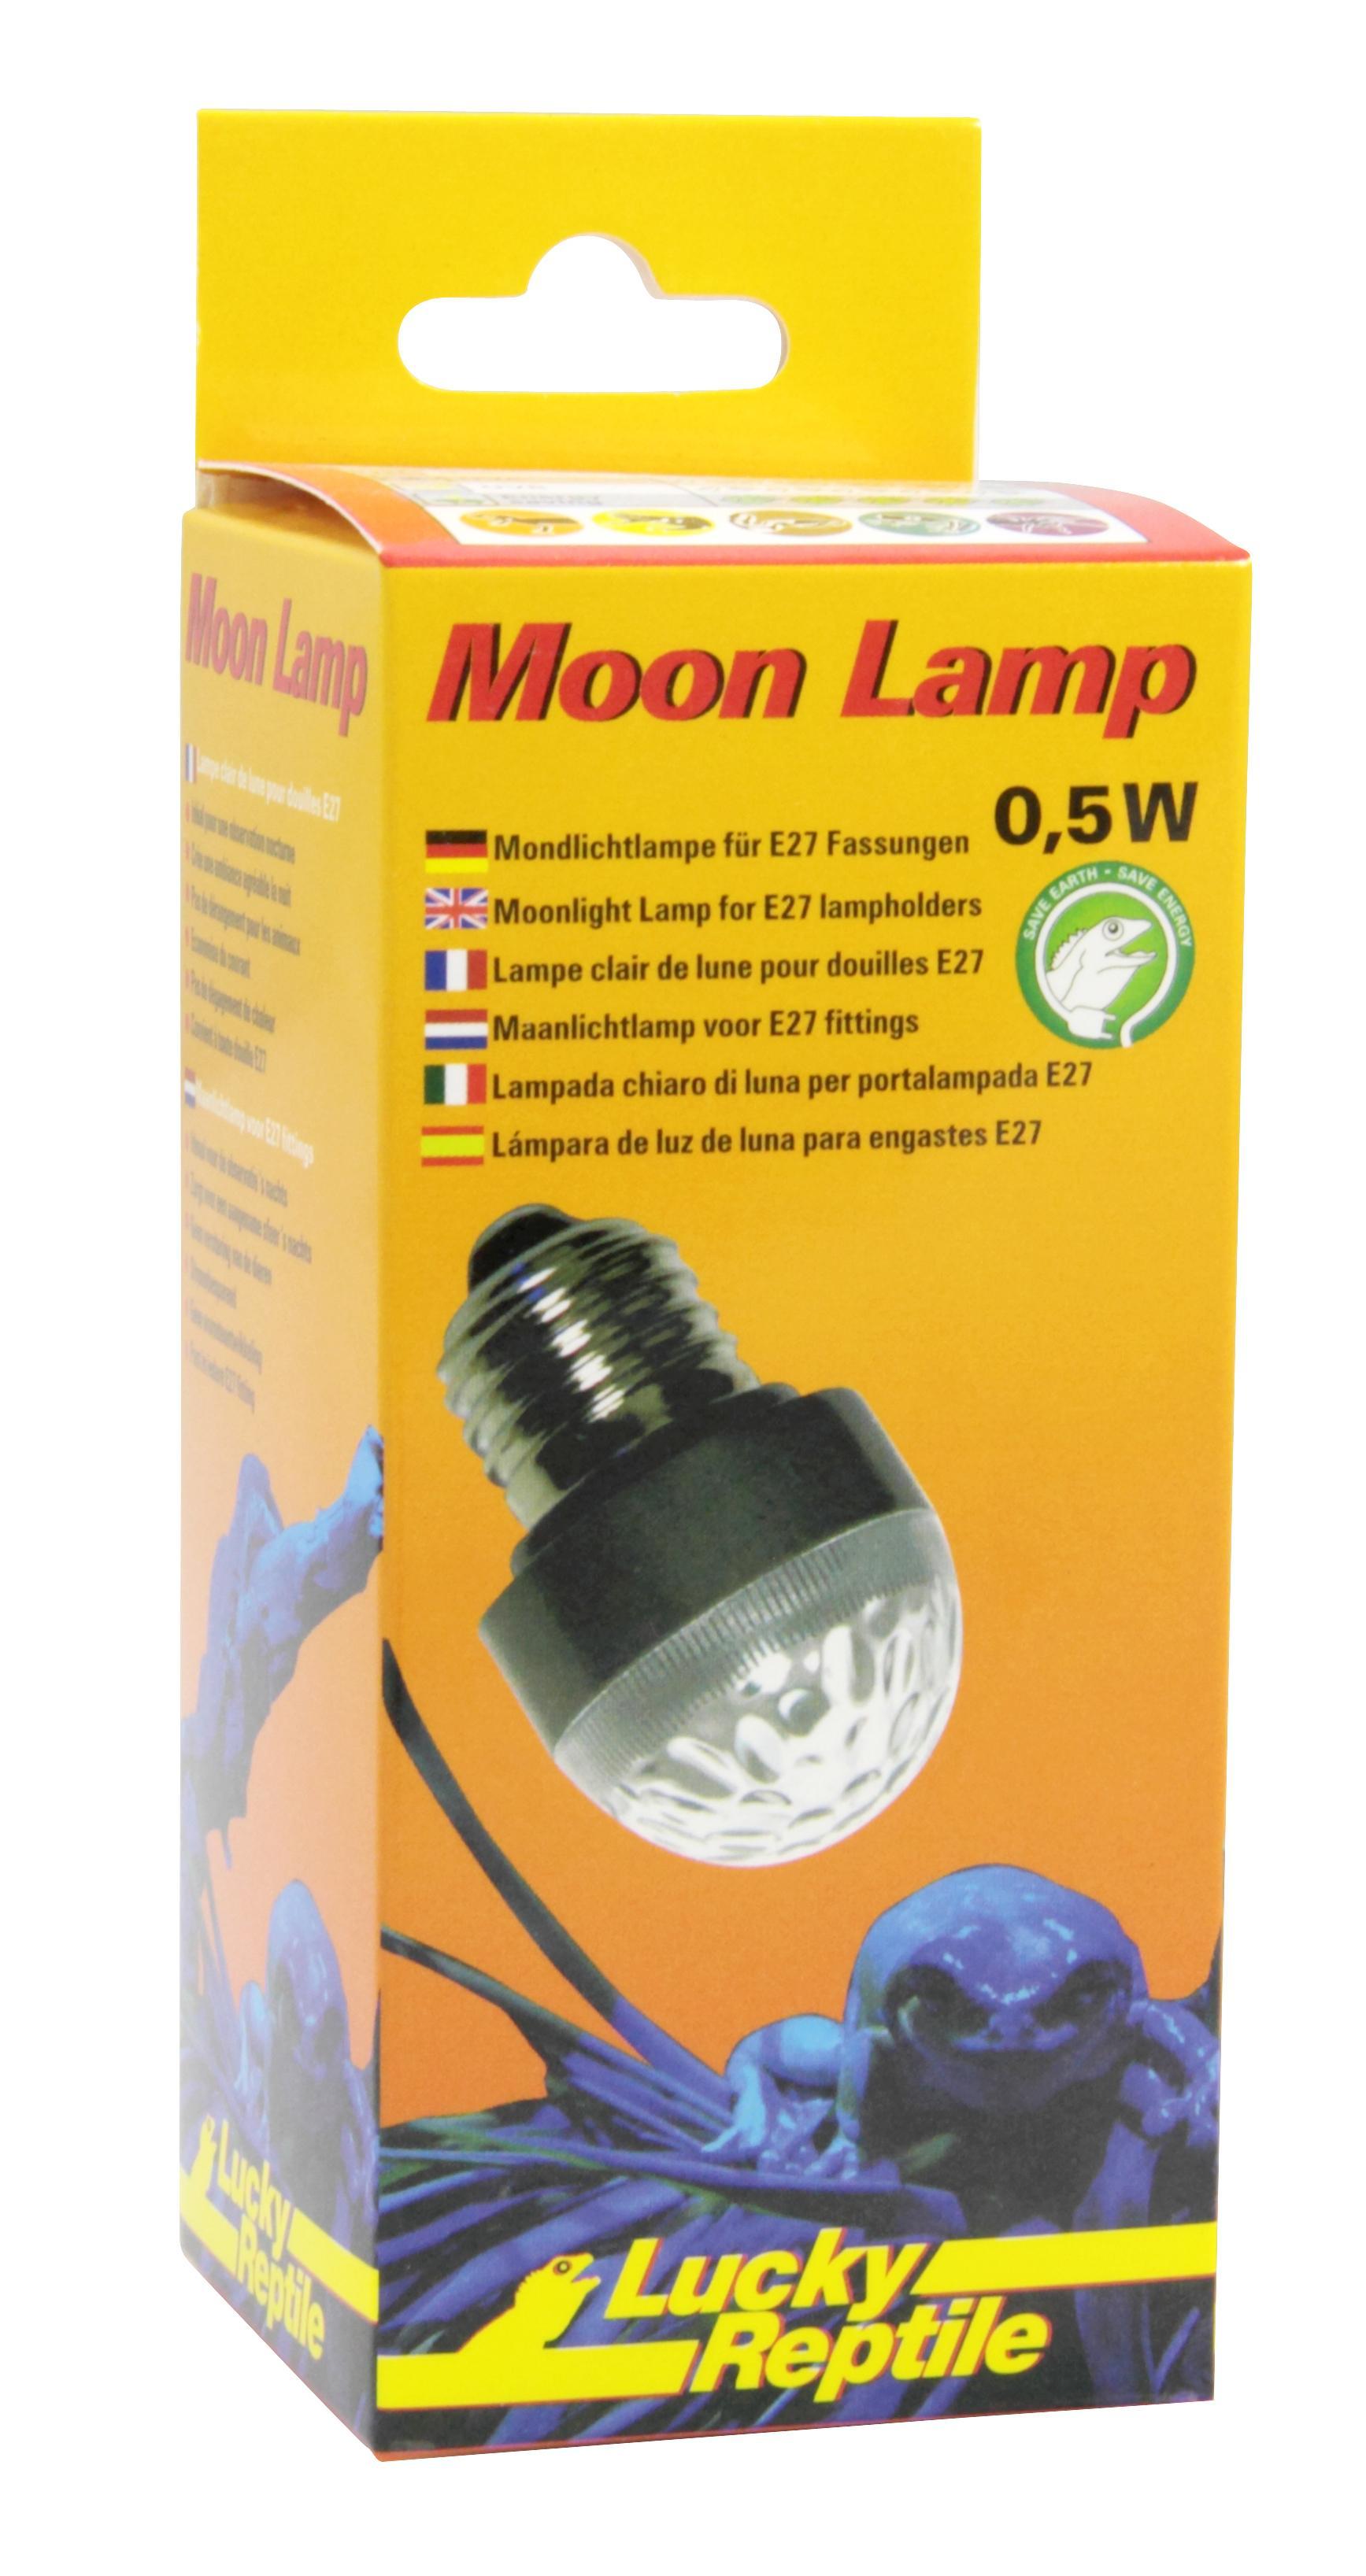 37dc0135-520e-4743-8b61-f9647bf63793 Wunderbar Lampe Mit E27 Fassung Dekorationen